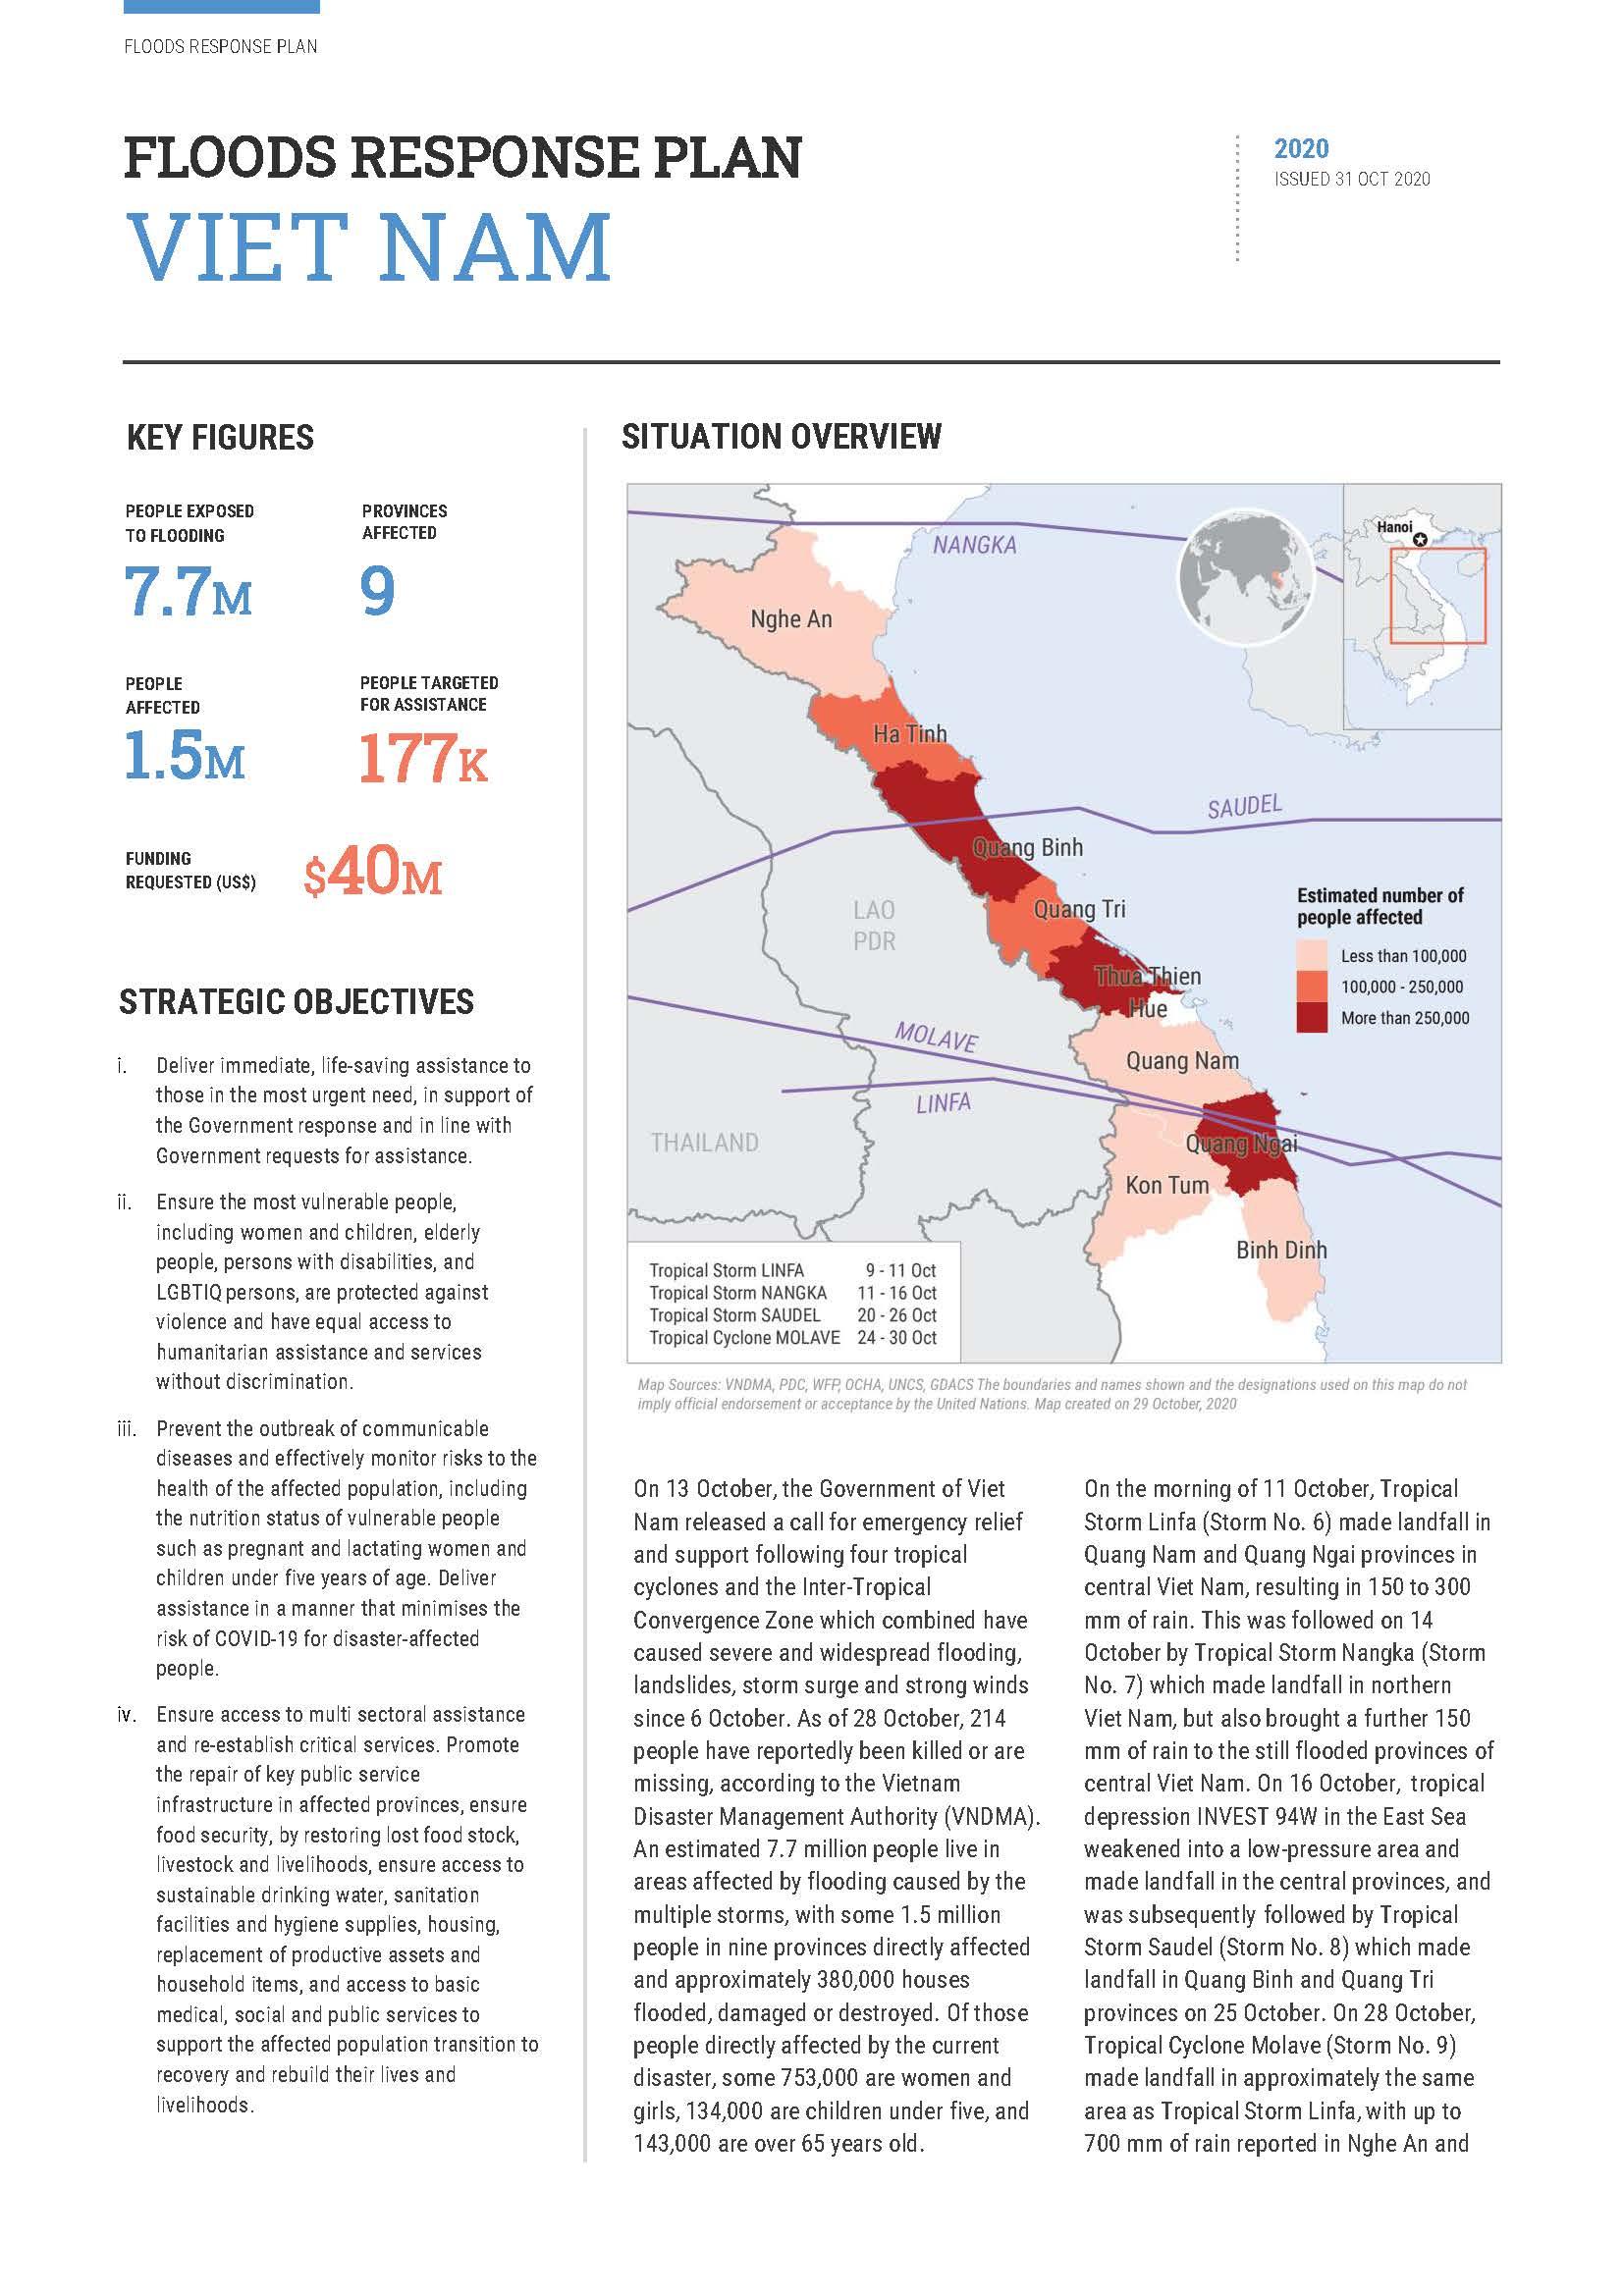 Viet Nam Floods Response Plan